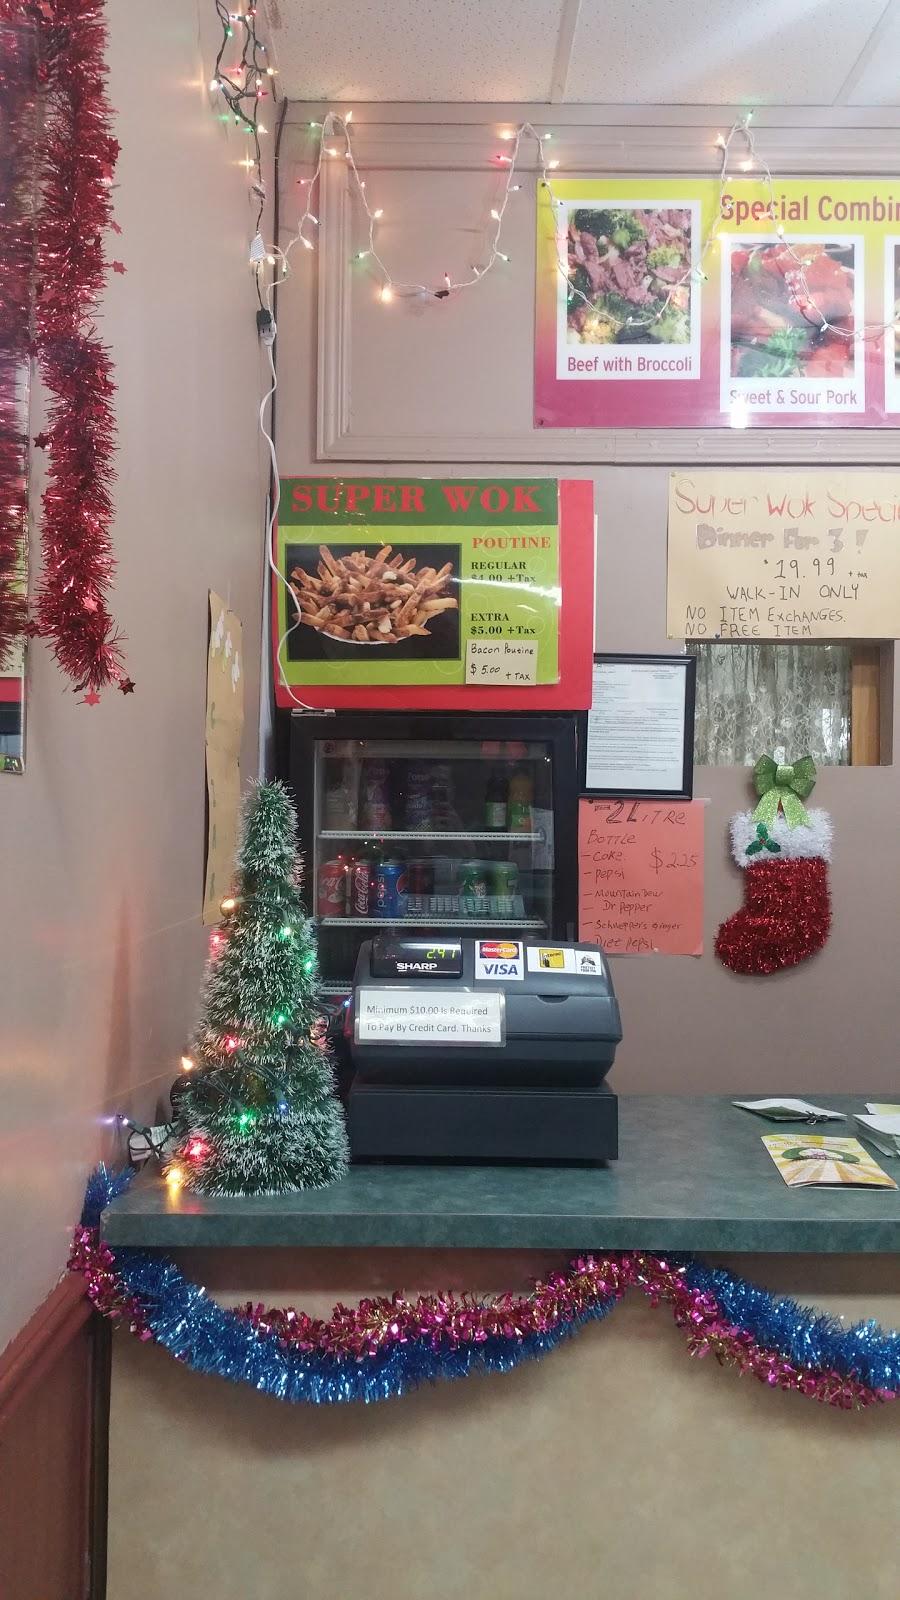 Super Wok Chinese Food | restaurant | 500 Rossland Rd W, Oshawa, ON L1J 3H2, Canada | 9054328838 OR +1 905-432-8838